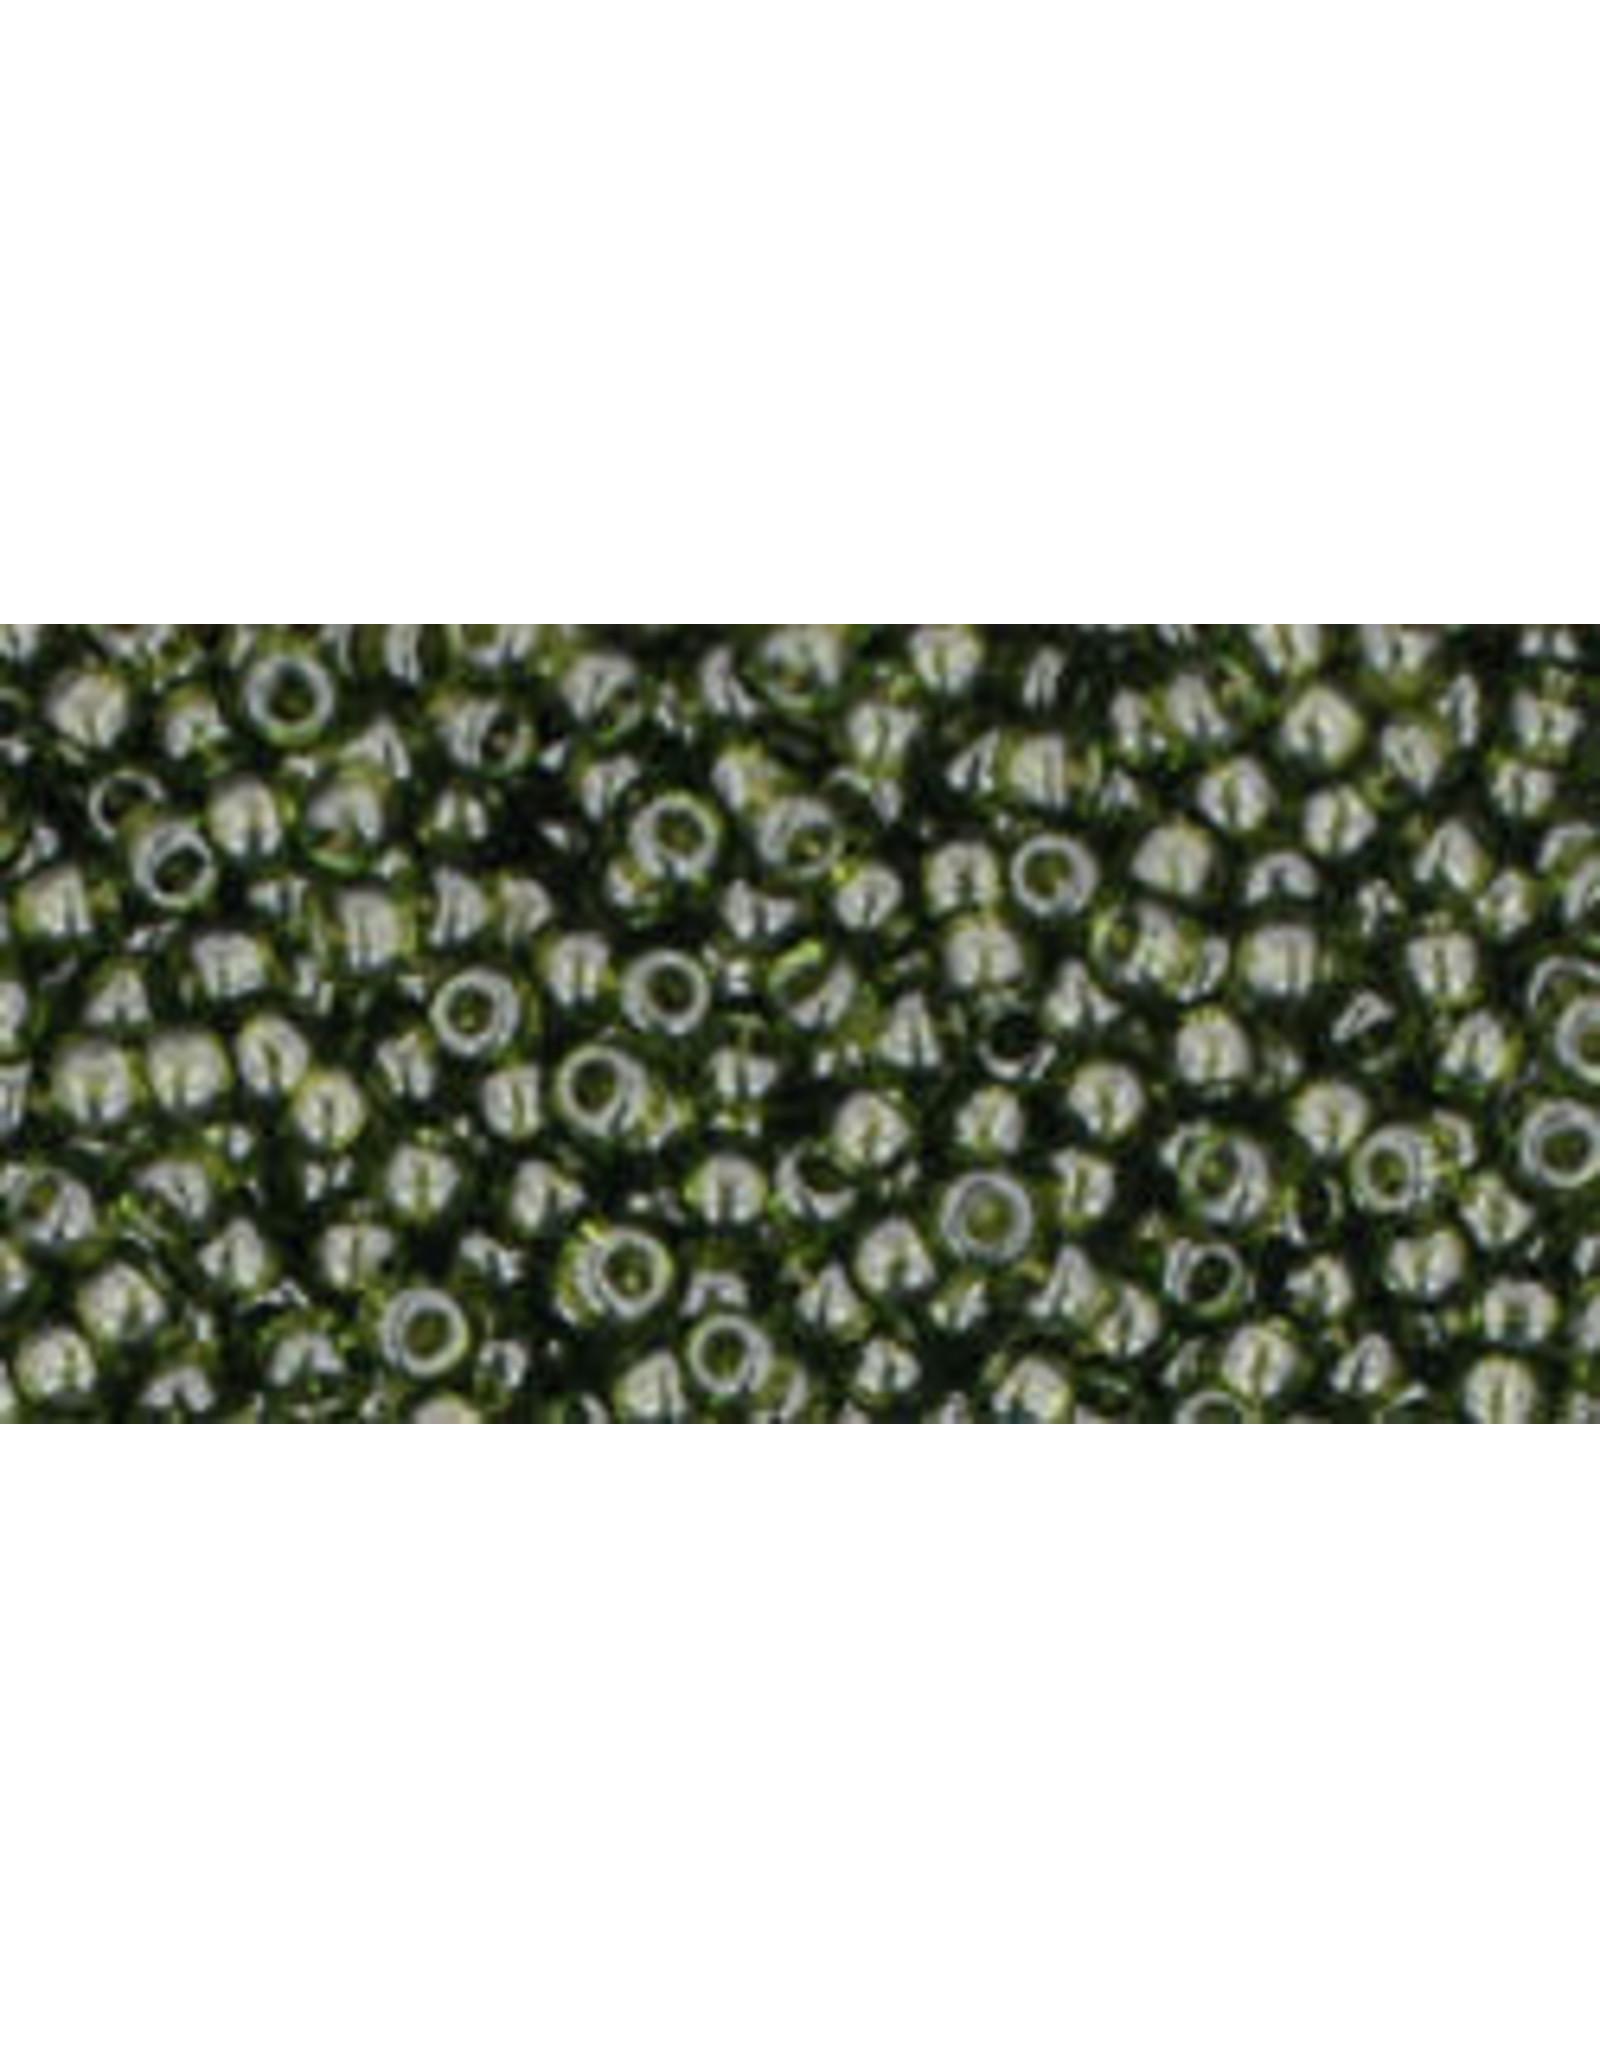 Toho 940B 11 Toho Round 40g Transparent Olive Green